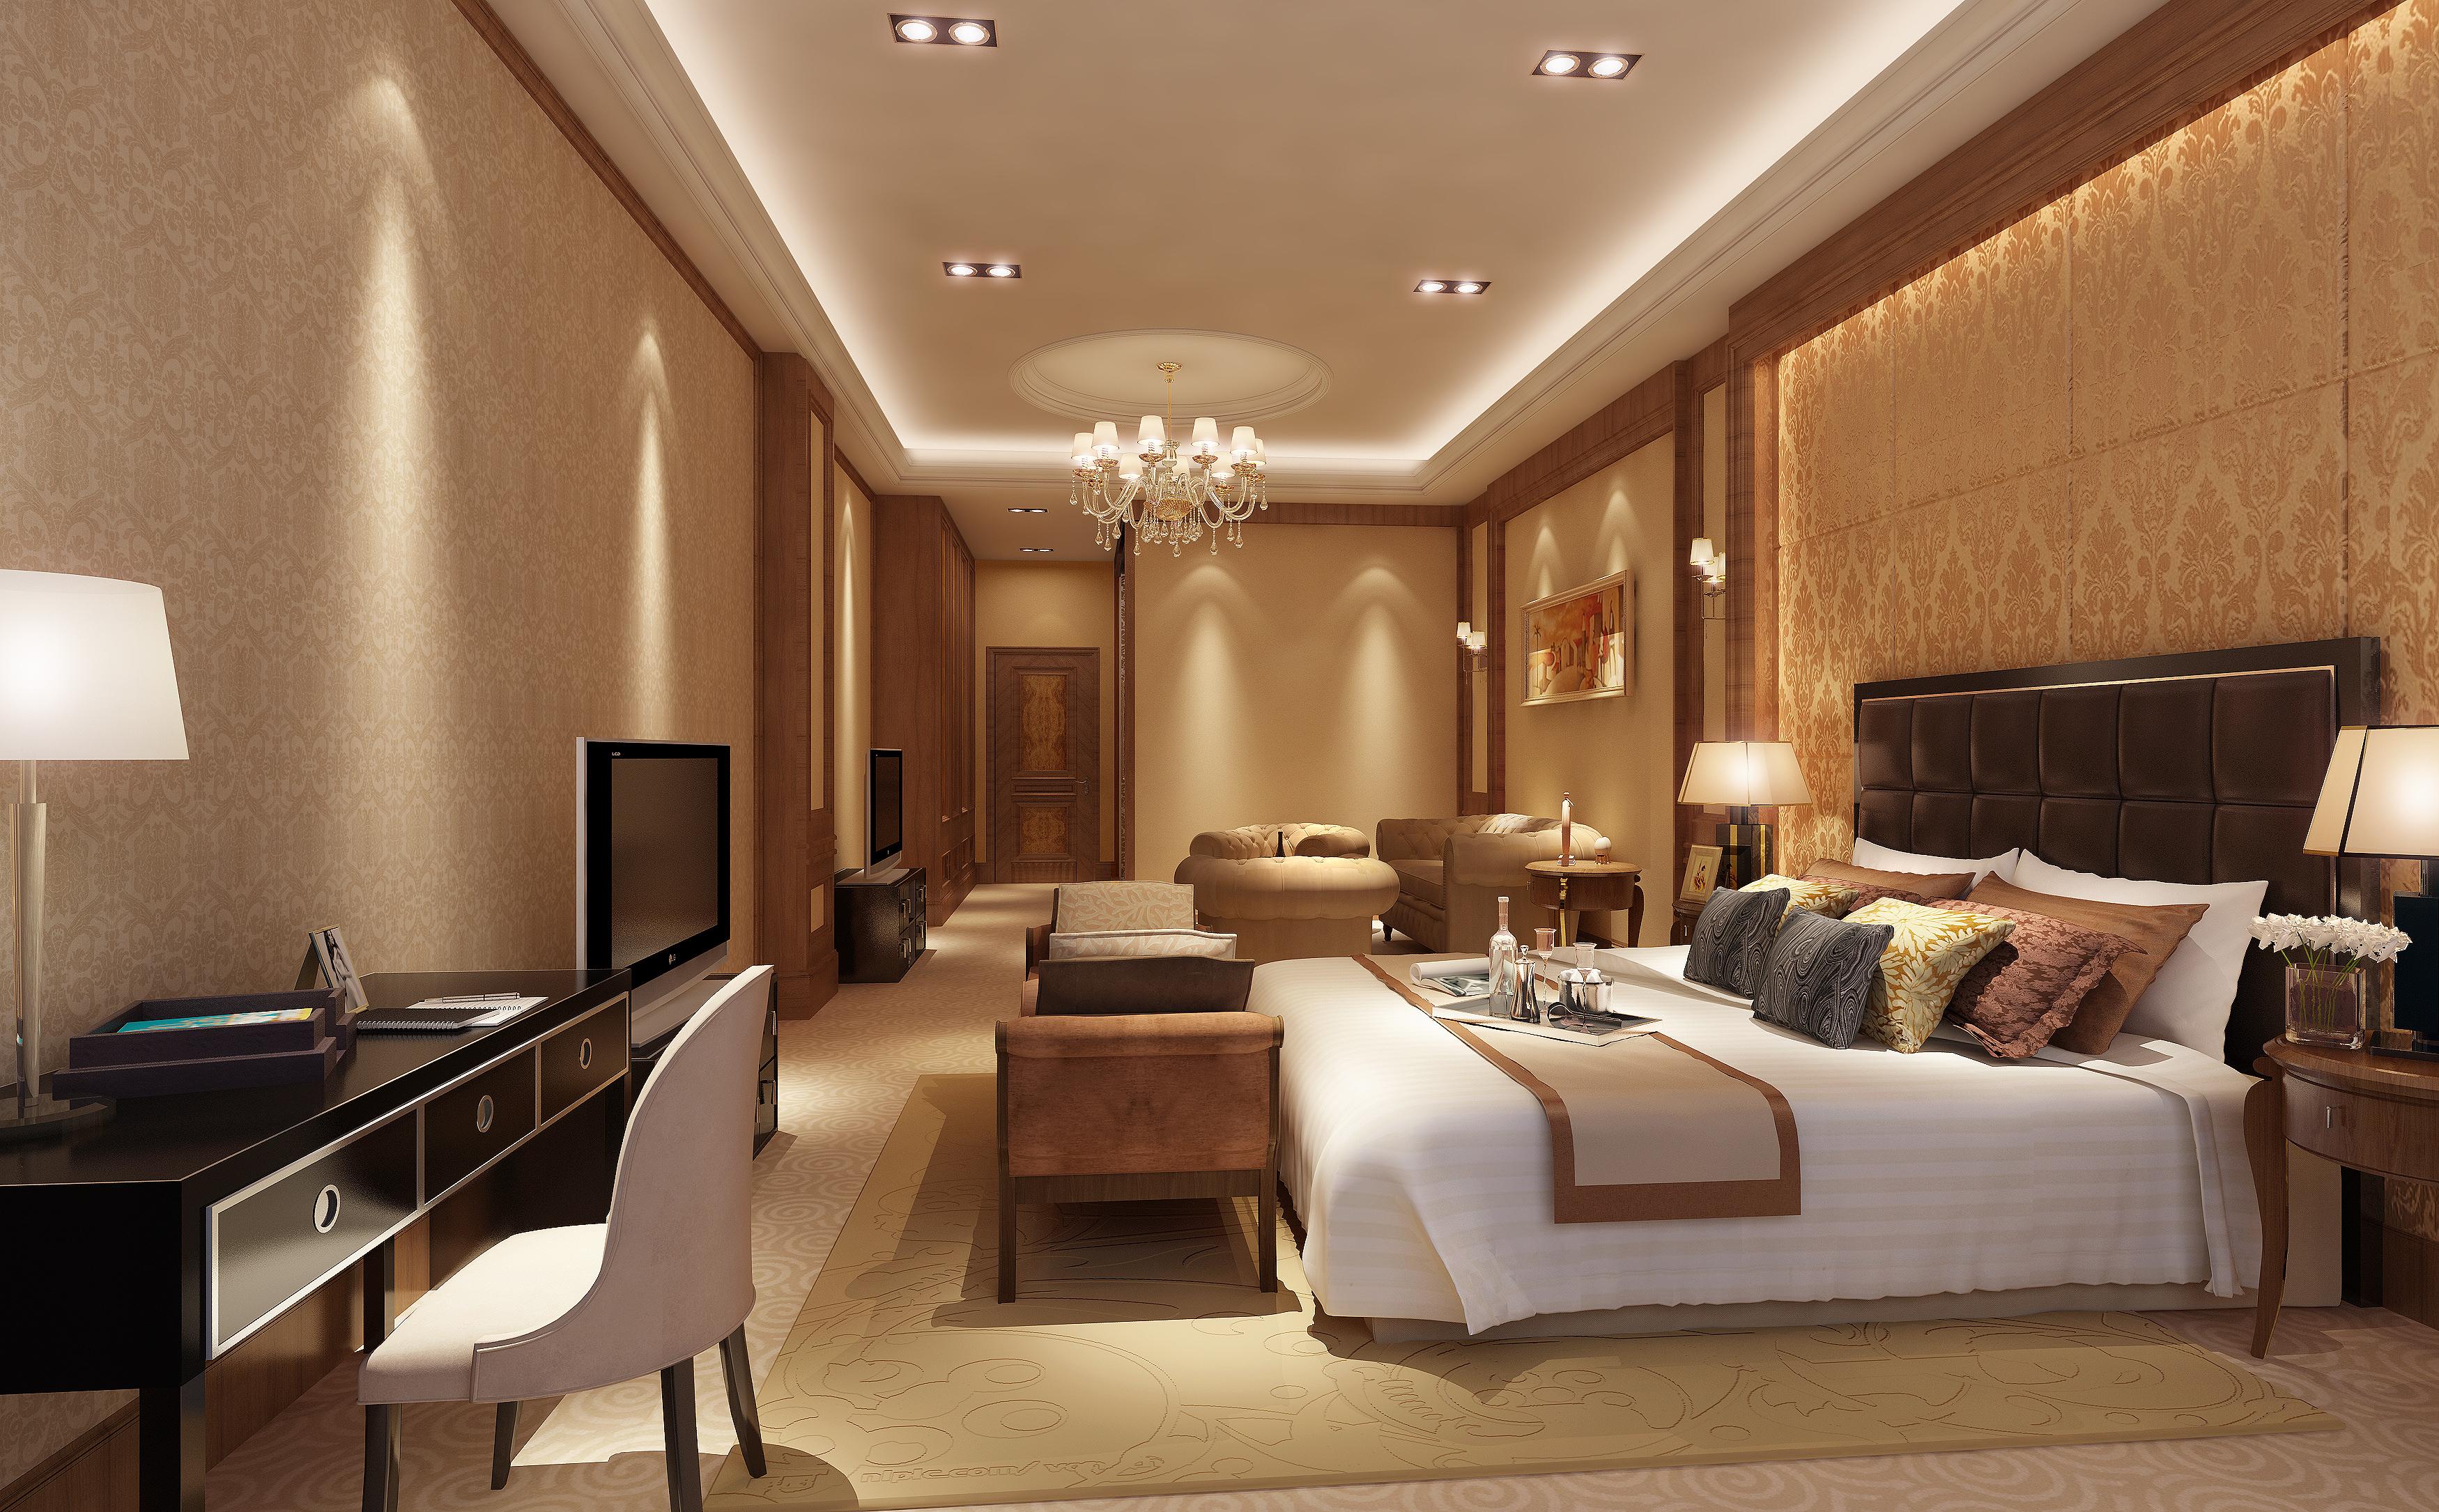 hotel-room 3D model Huge bedroom | CGTrader